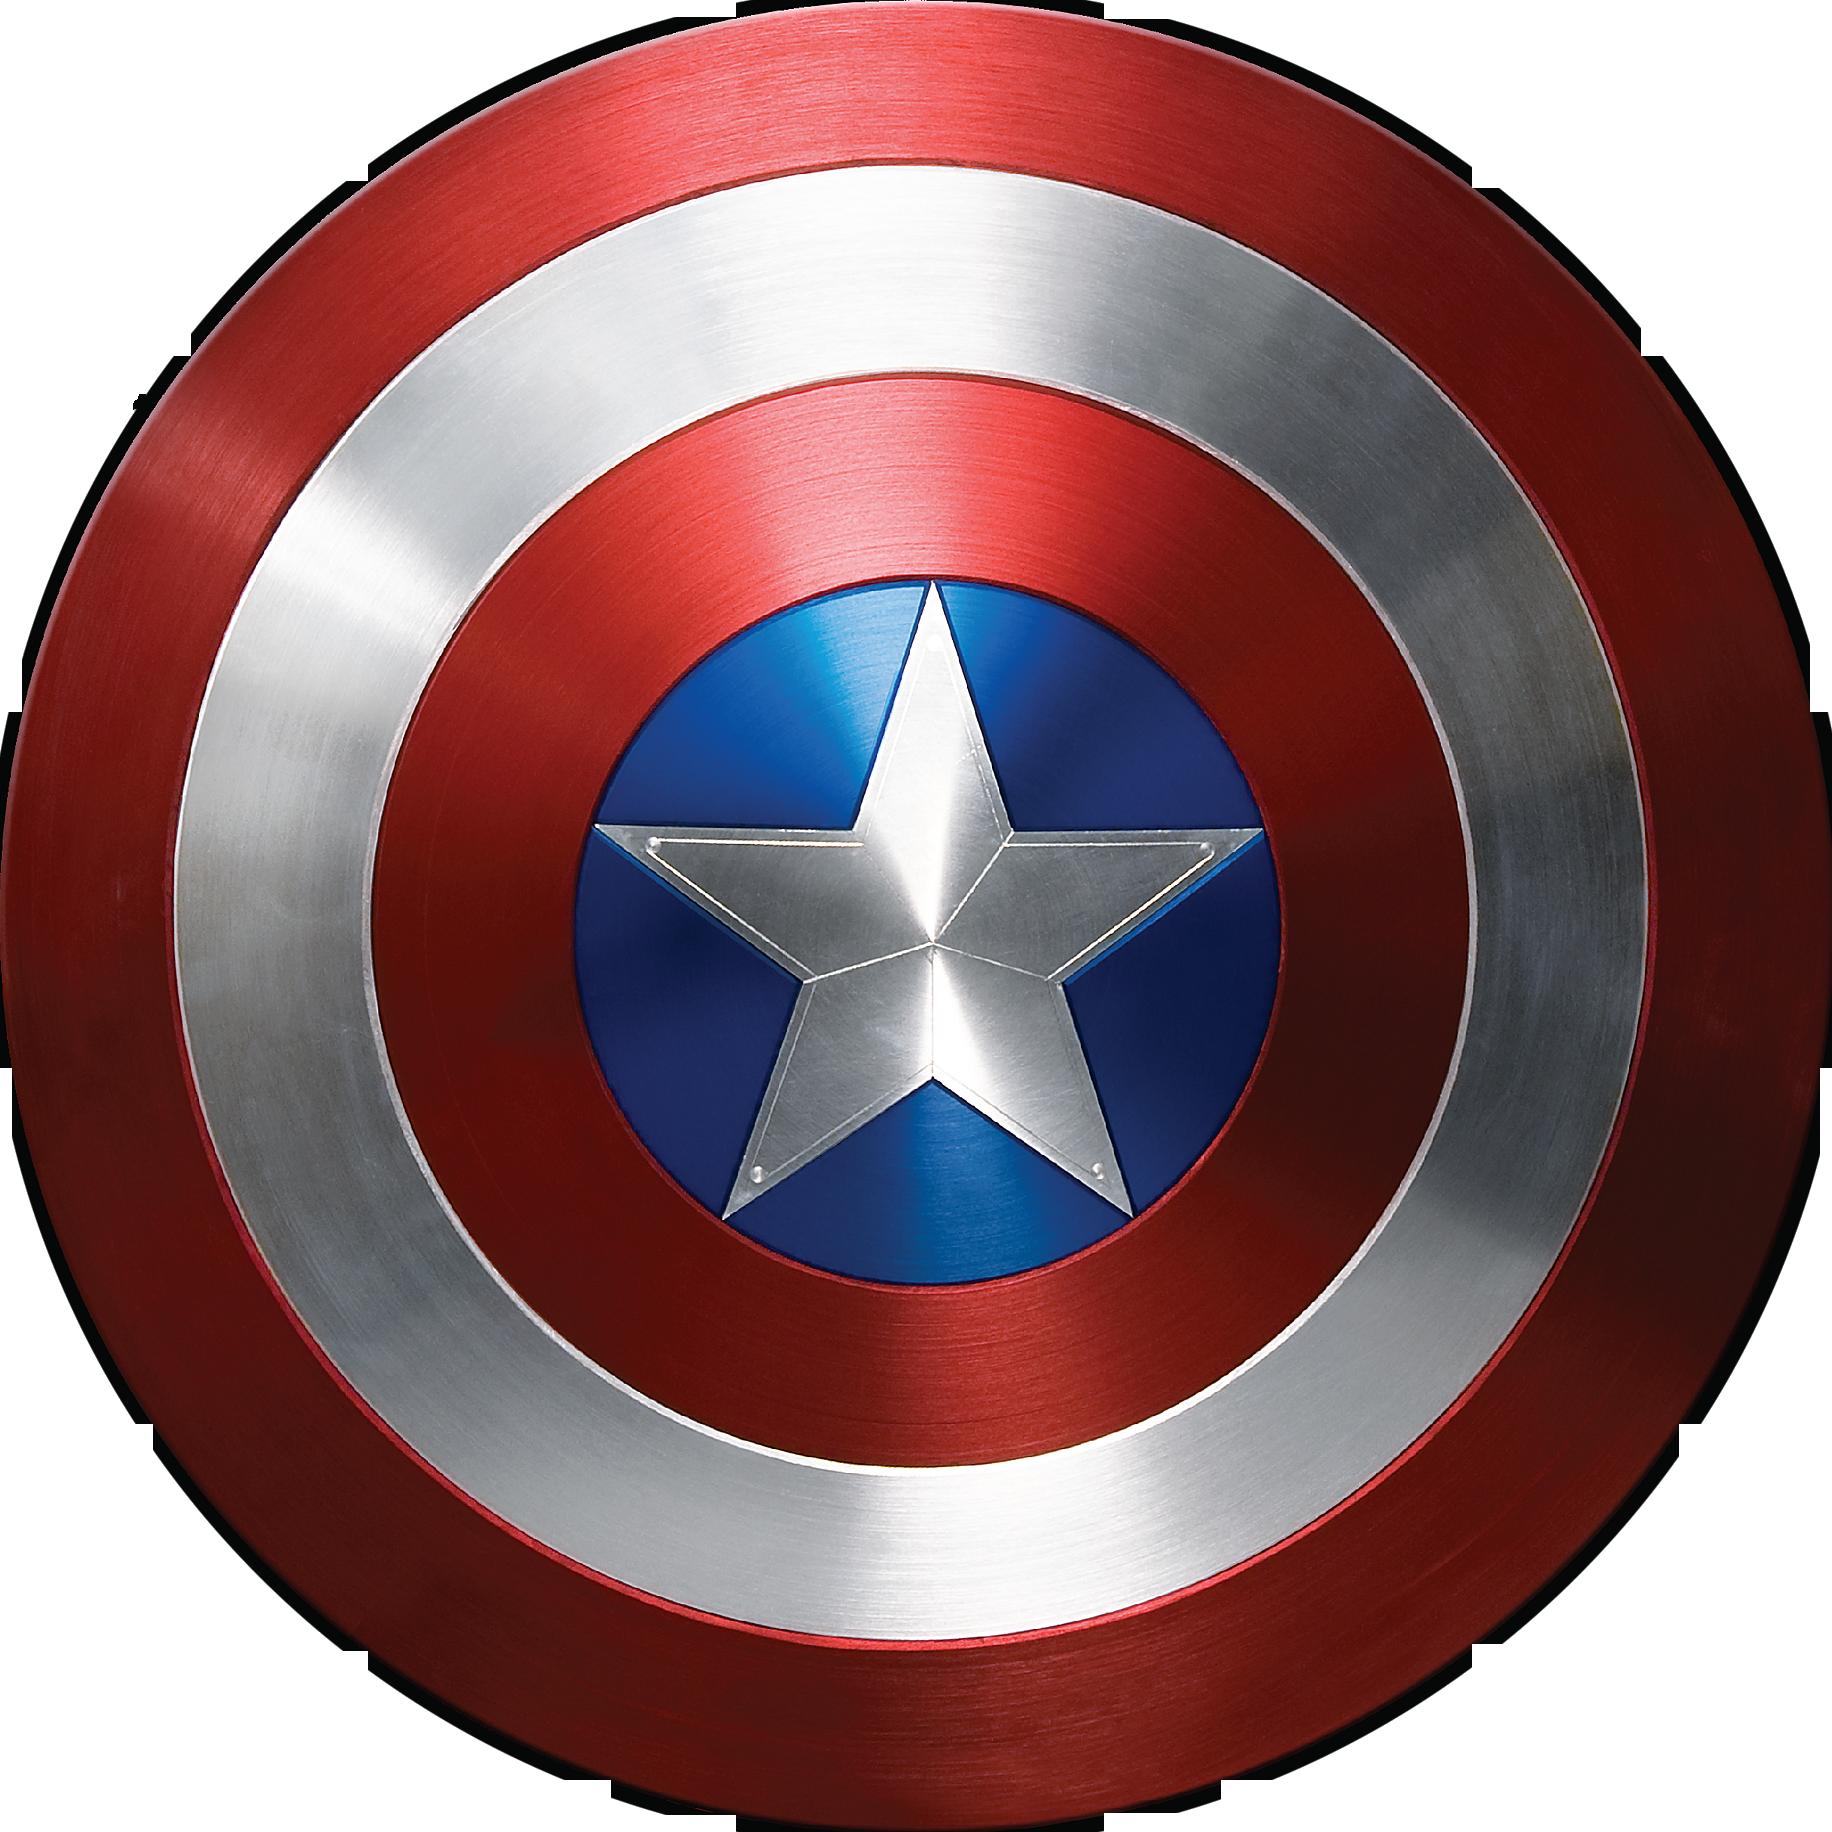 image captain america shield png marvel cinematic black spiderman logic lyrics black spiderman logic lyrics